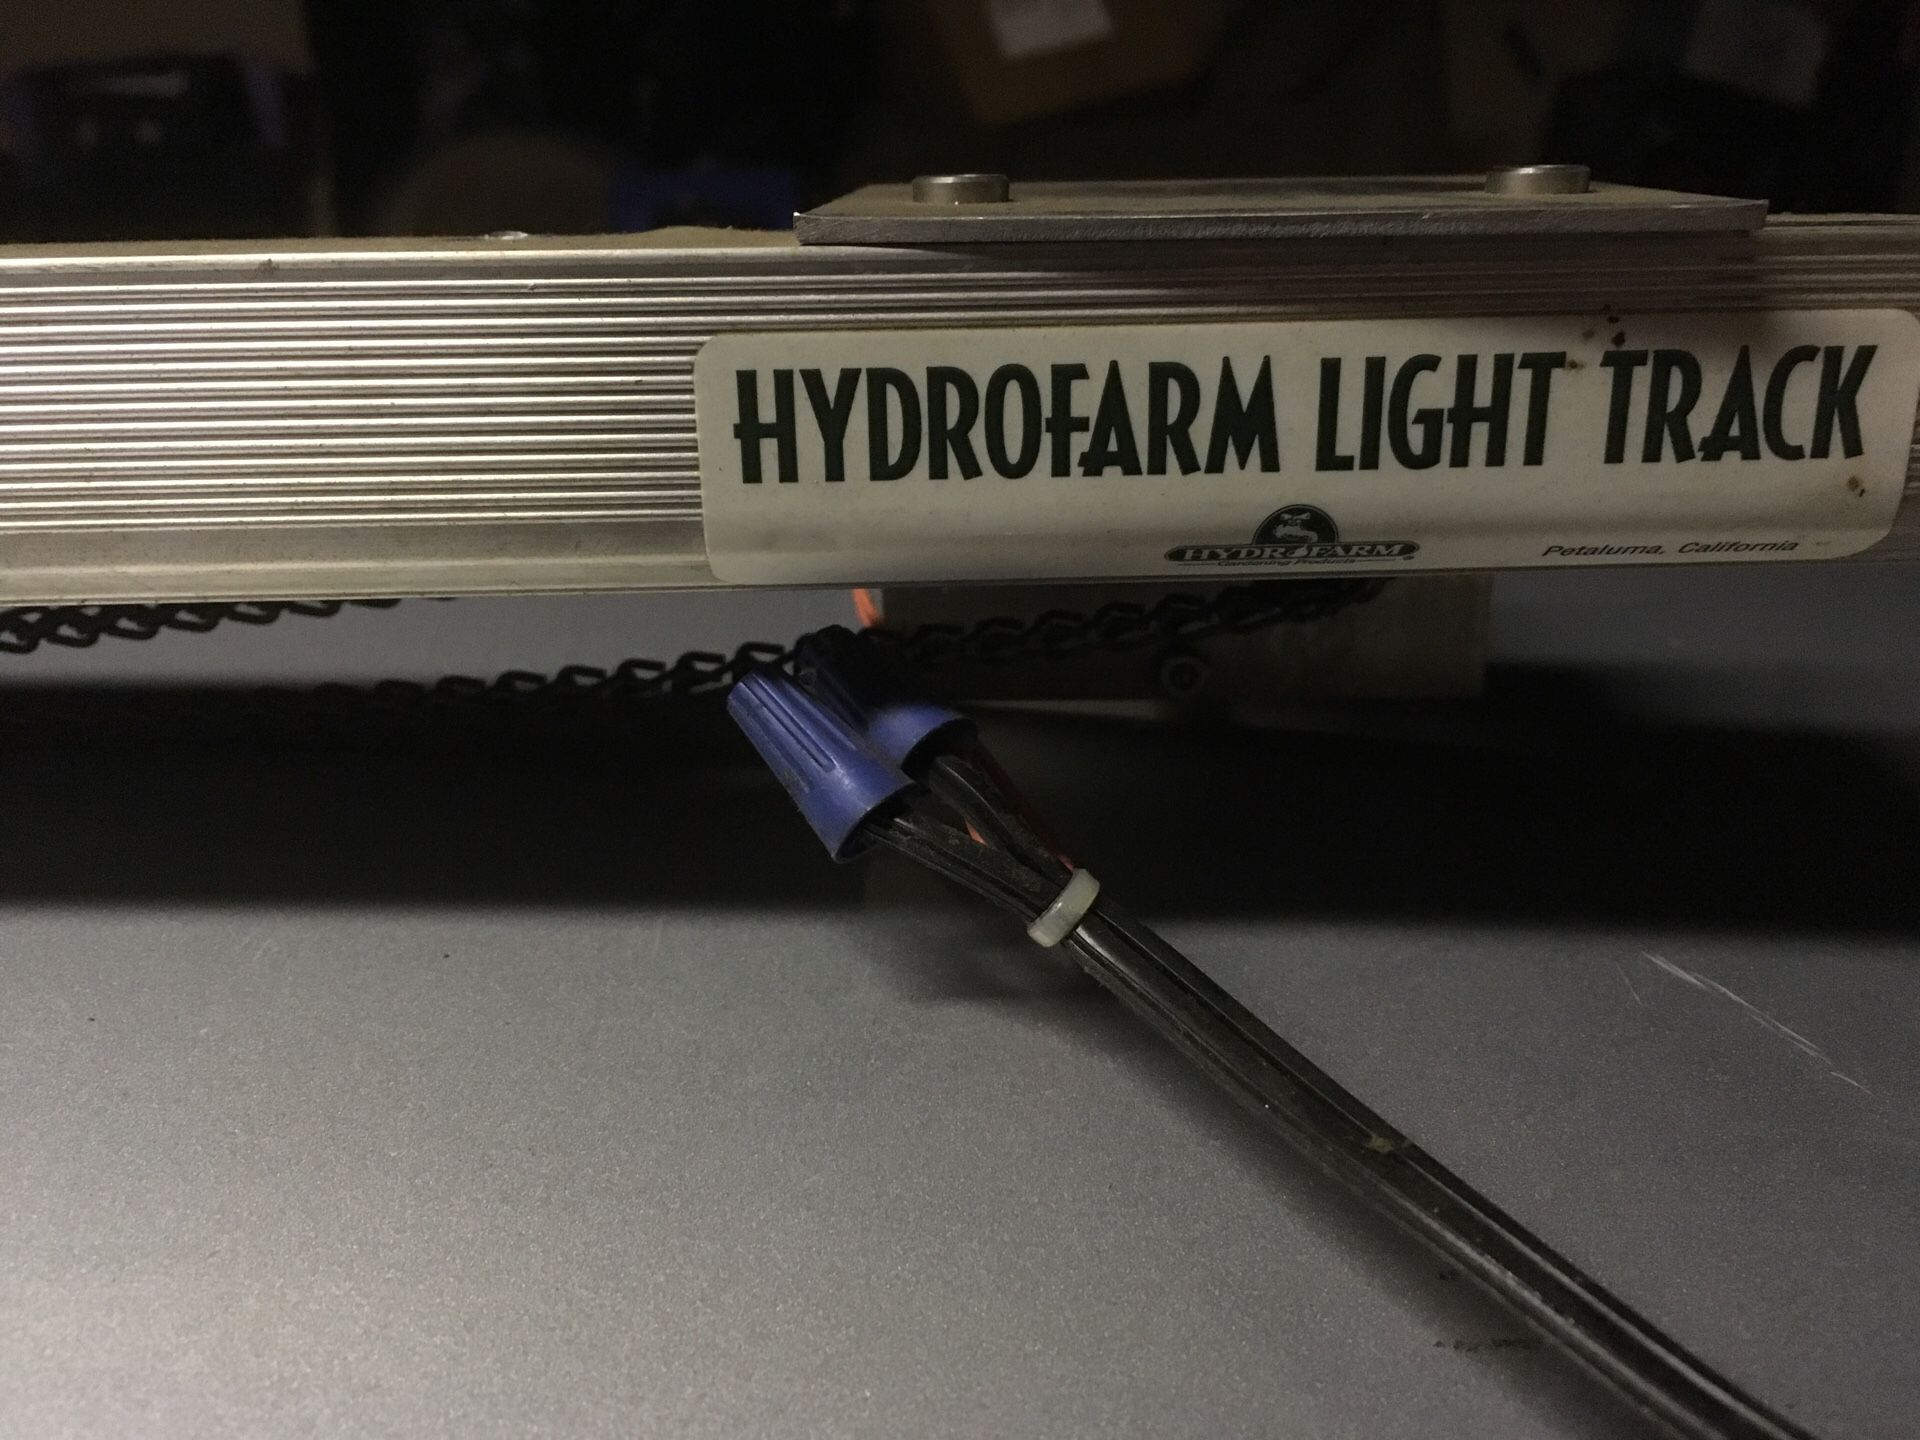 Hydrofarm light track